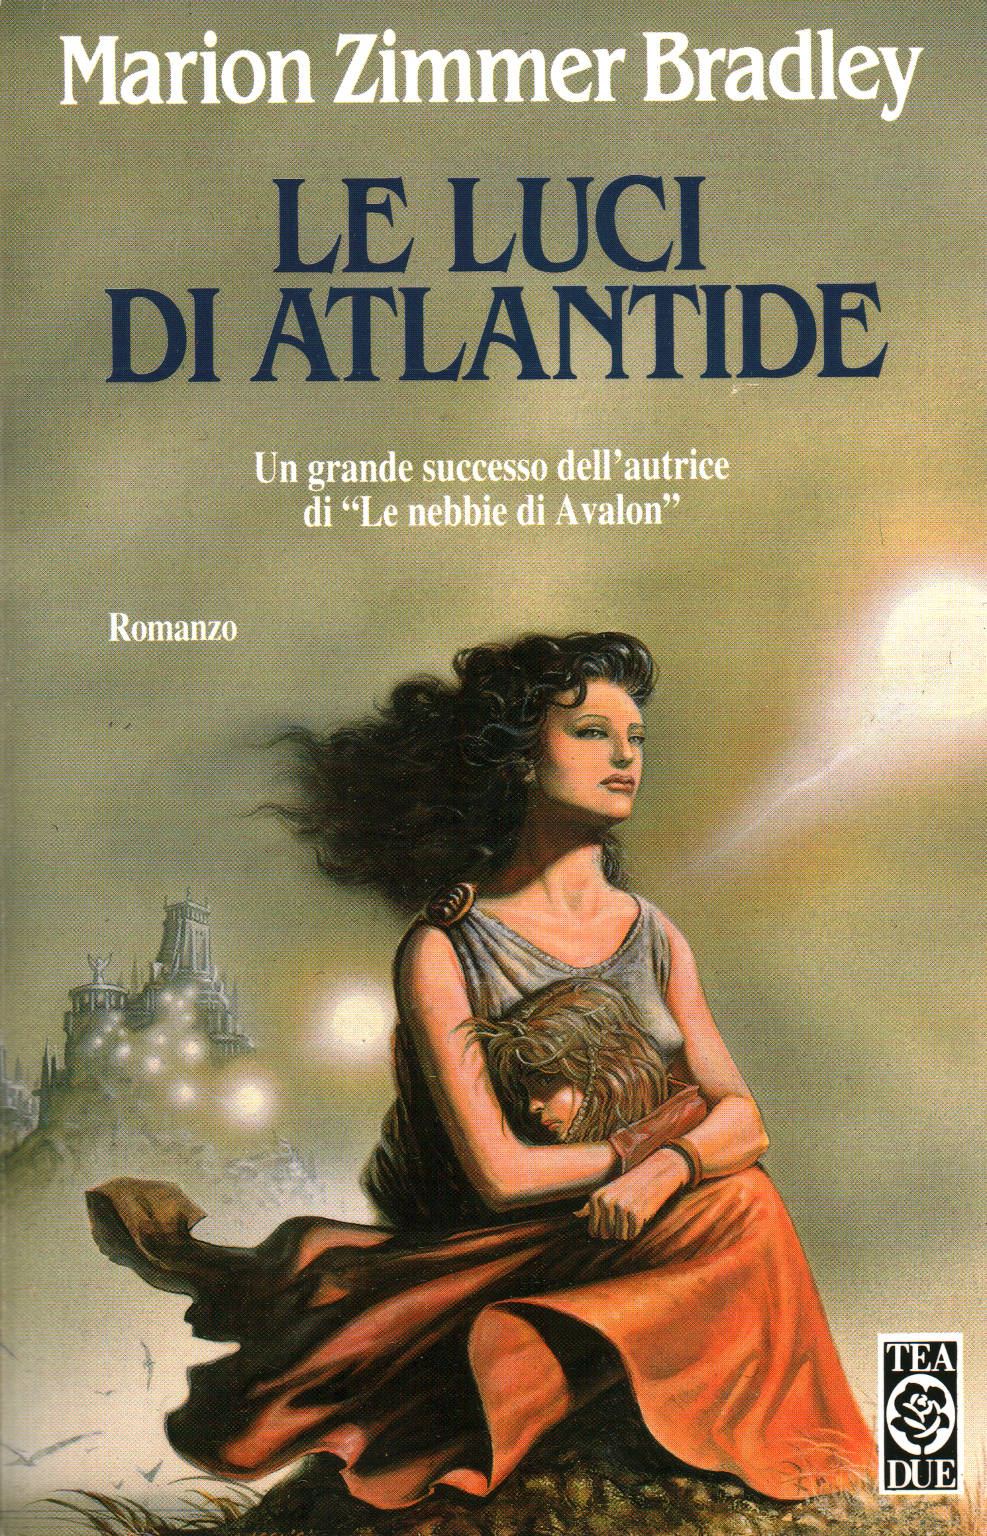 Читать книги про ведьм фантастика